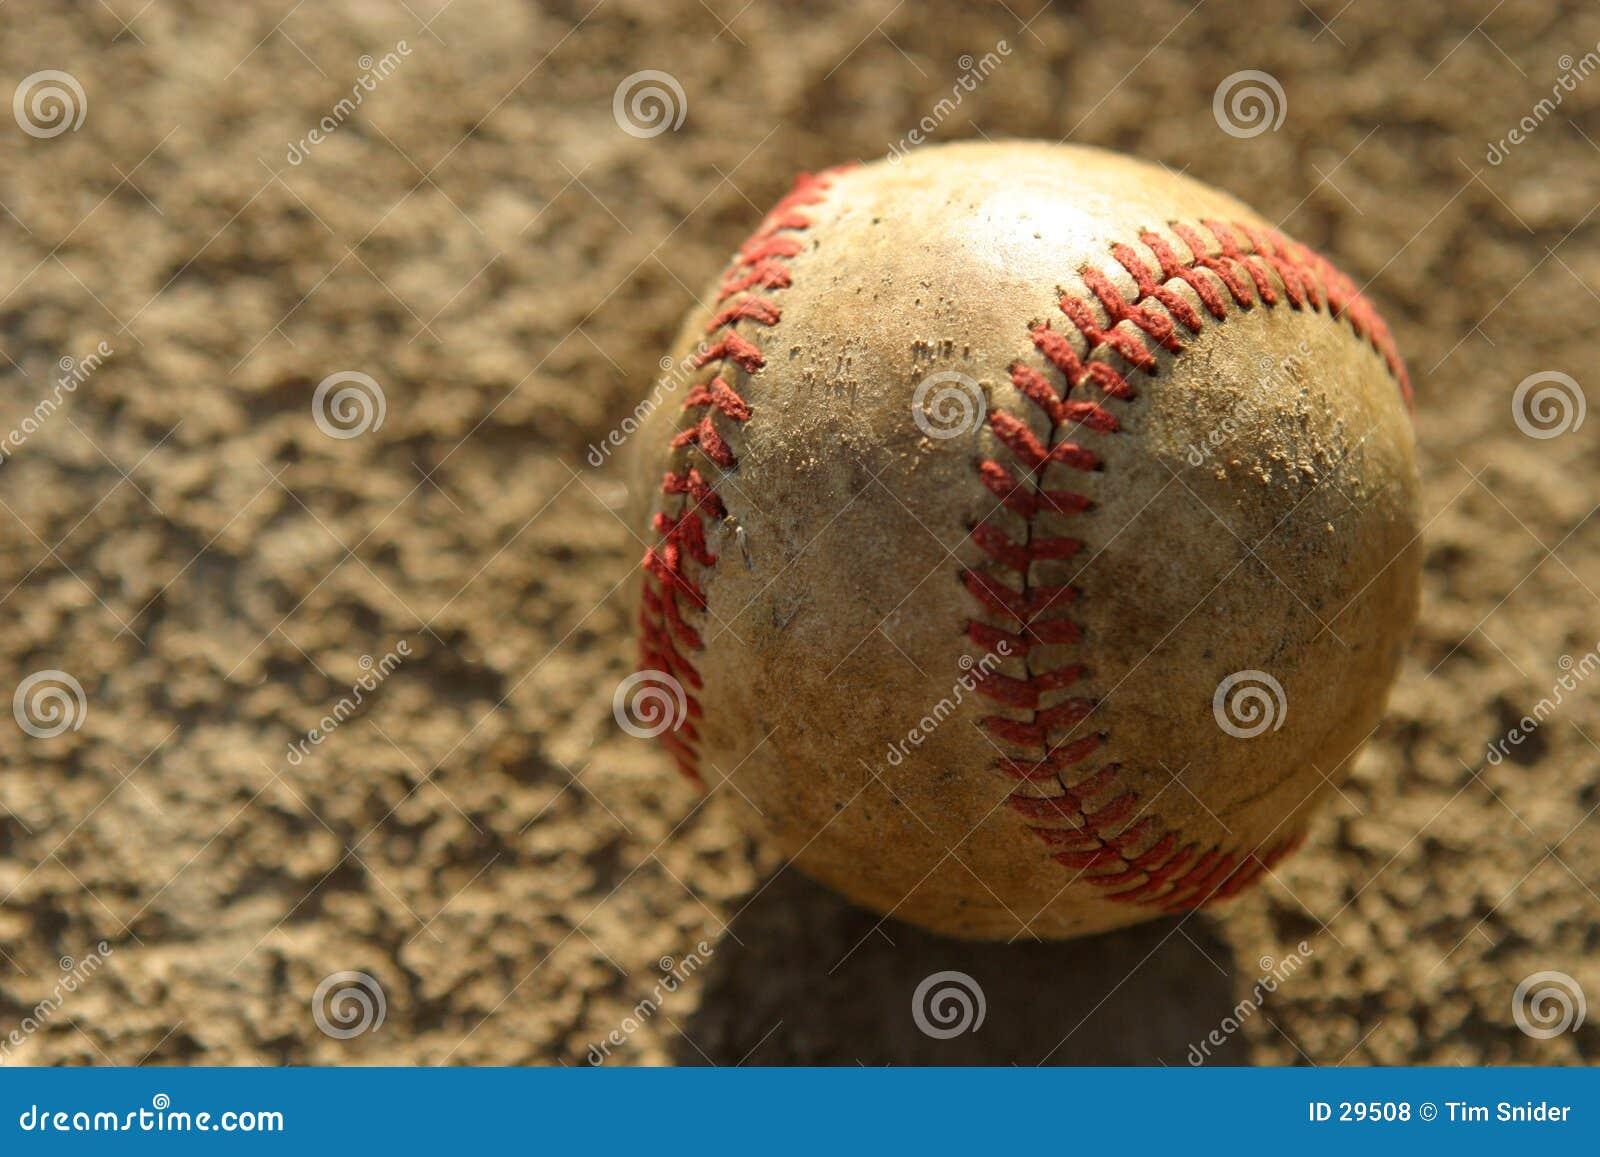 Verwendeter Baseball